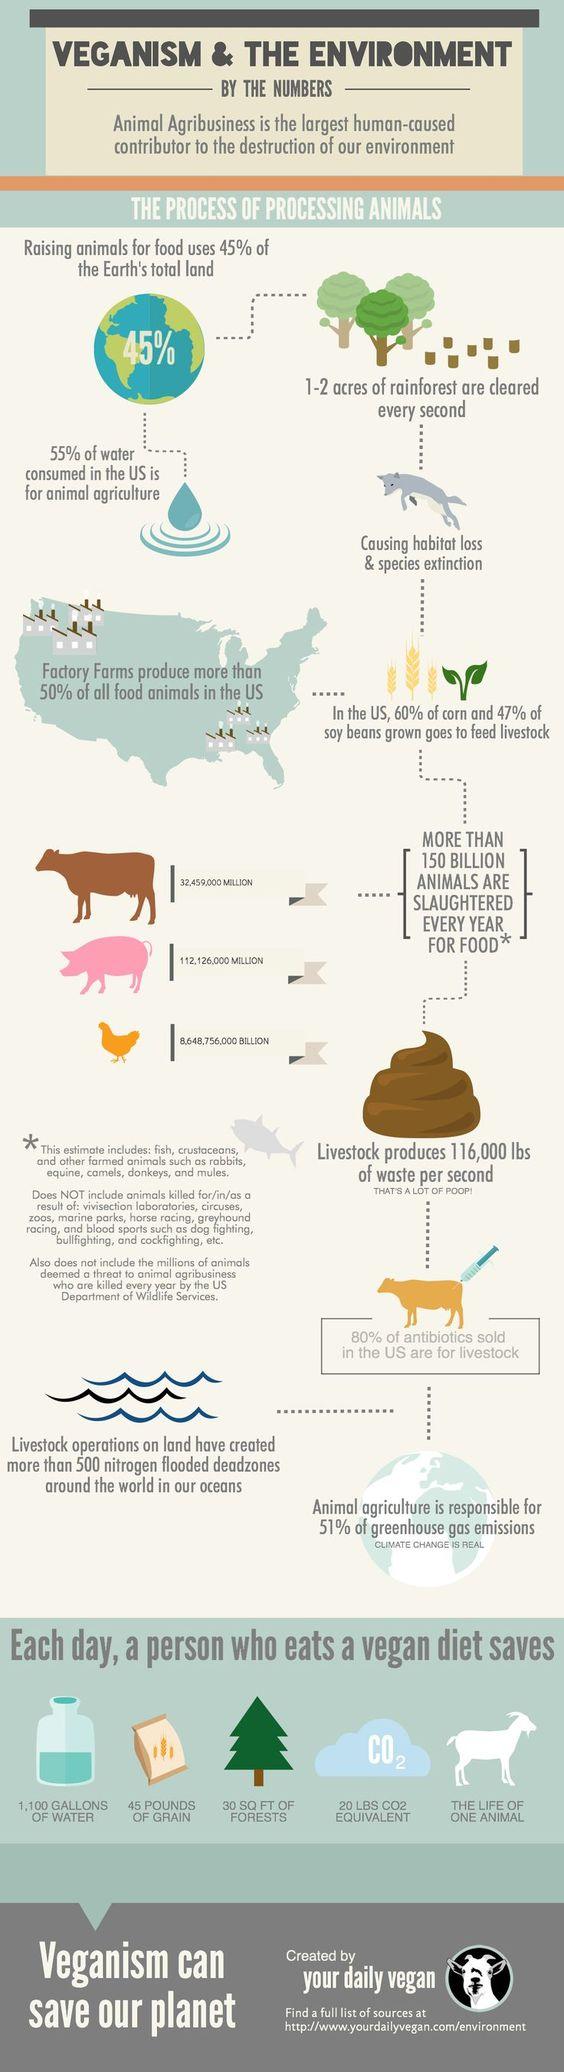 vegan and the planet.jpg